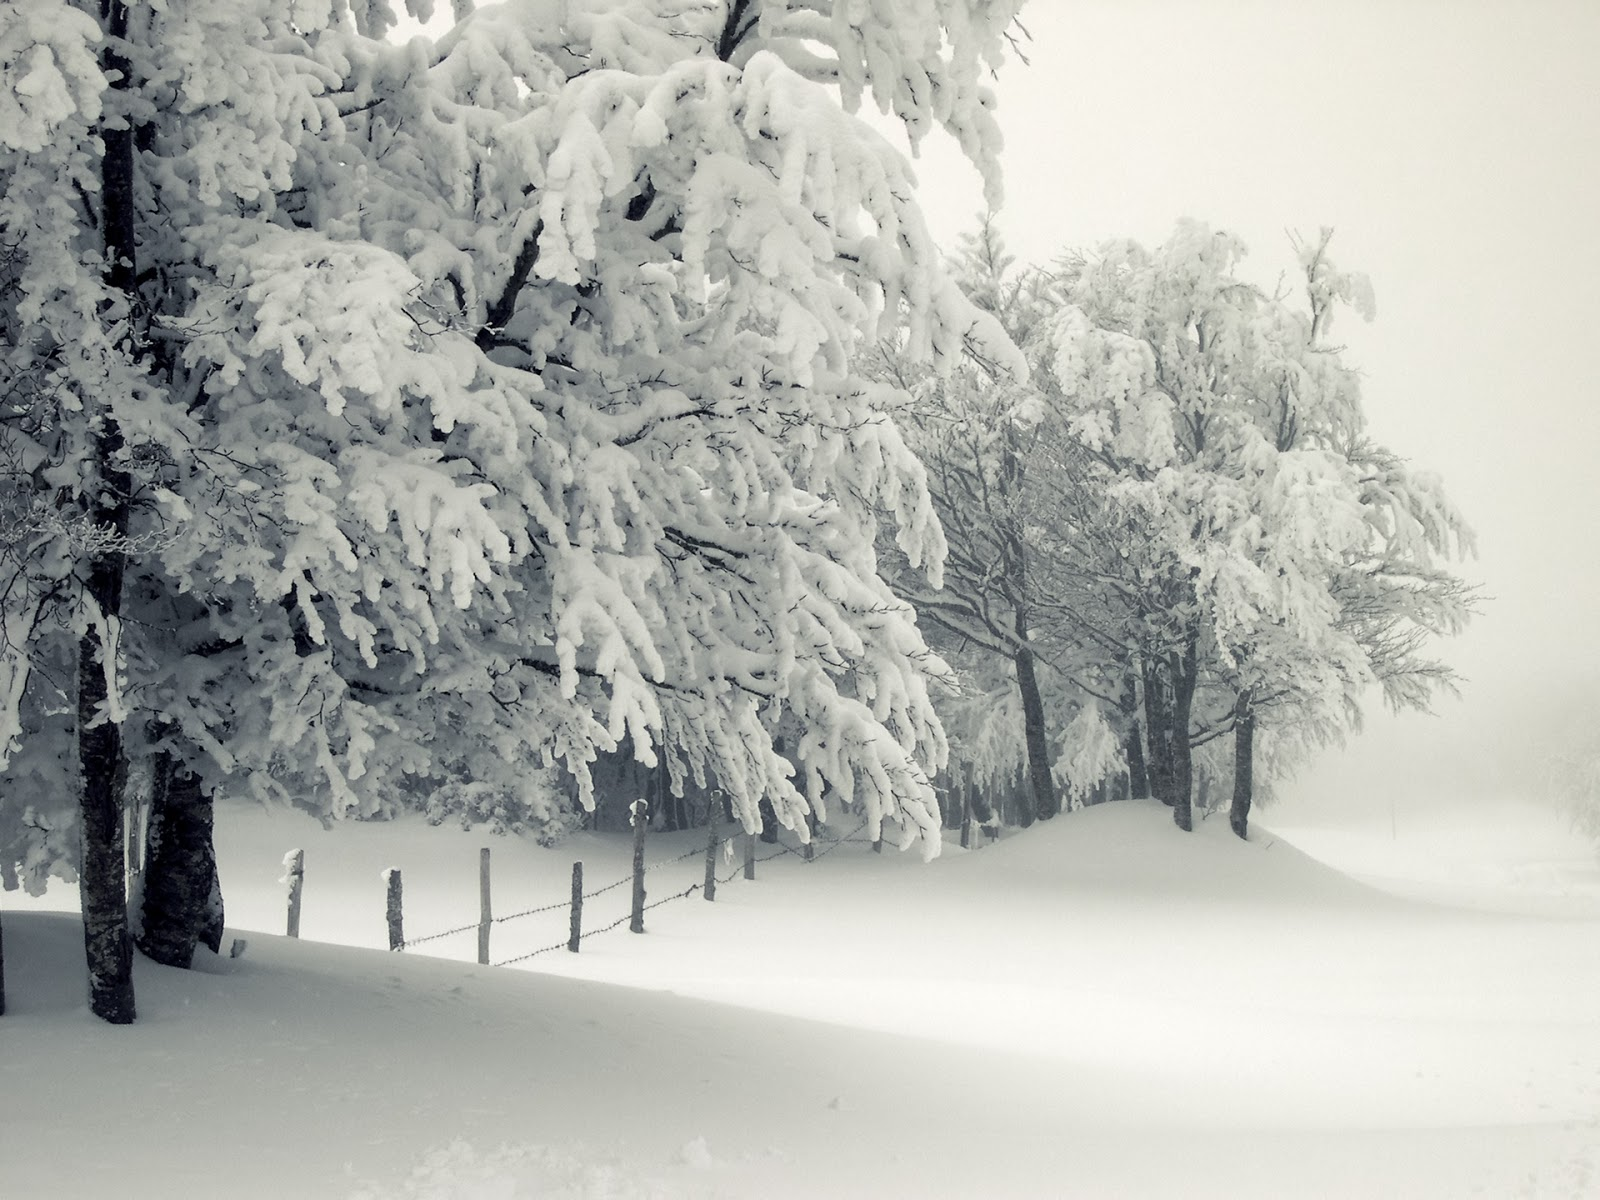 snow trip packing list